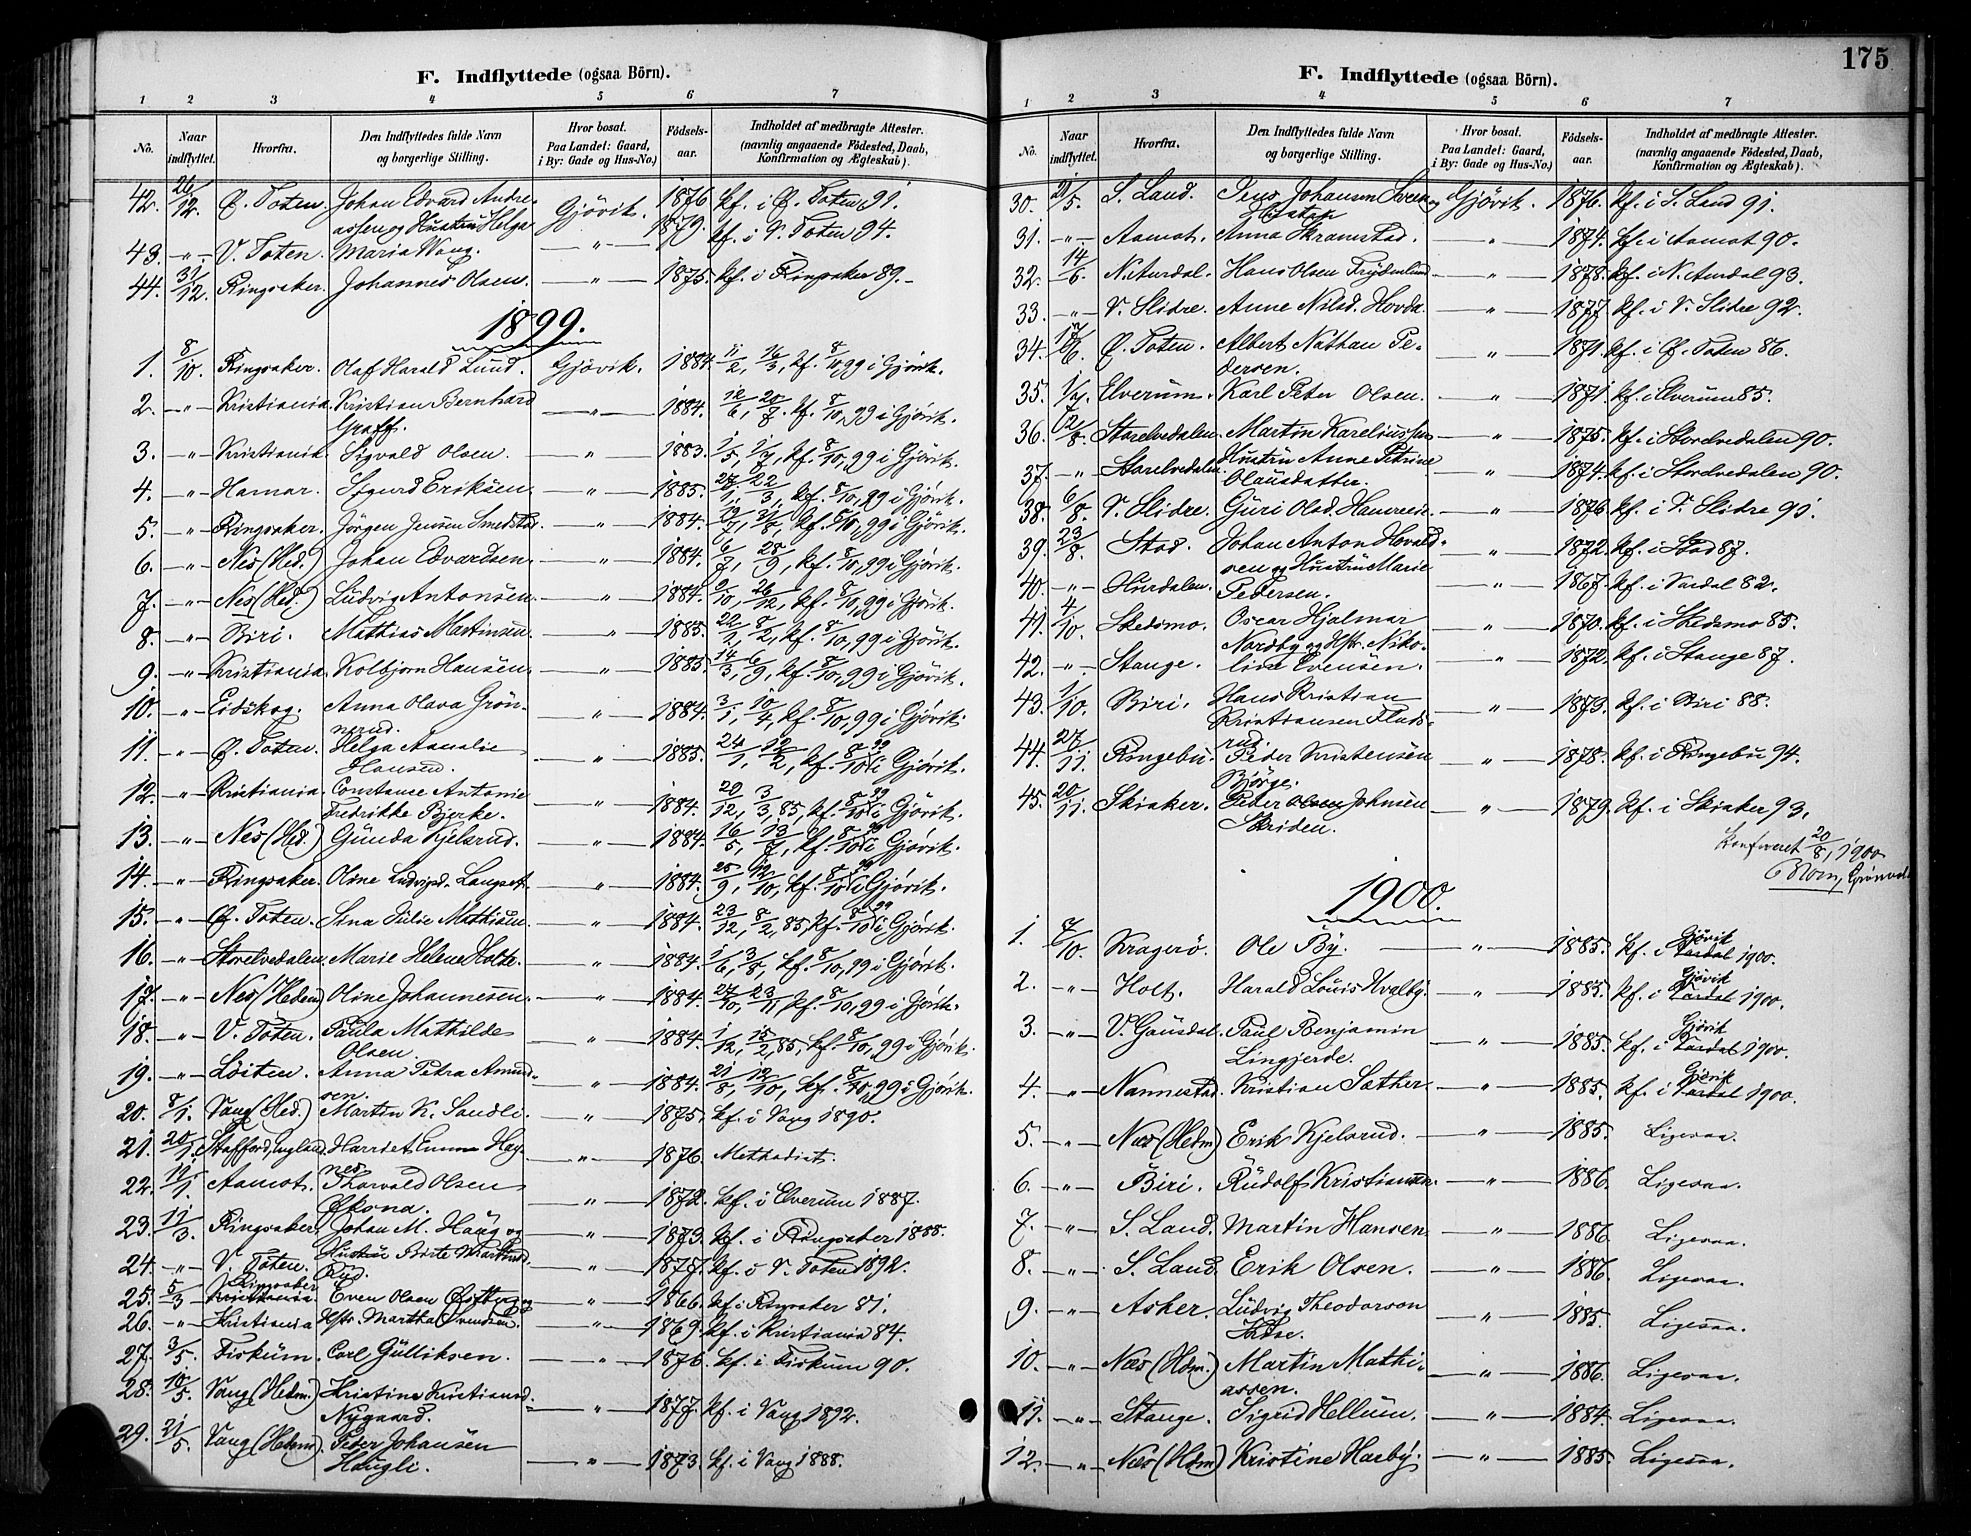 SAH, Vardal prestekontor, H/Ha/Haa/L0011: Ministerialbok nr. 11, 1891-1901, s. 175